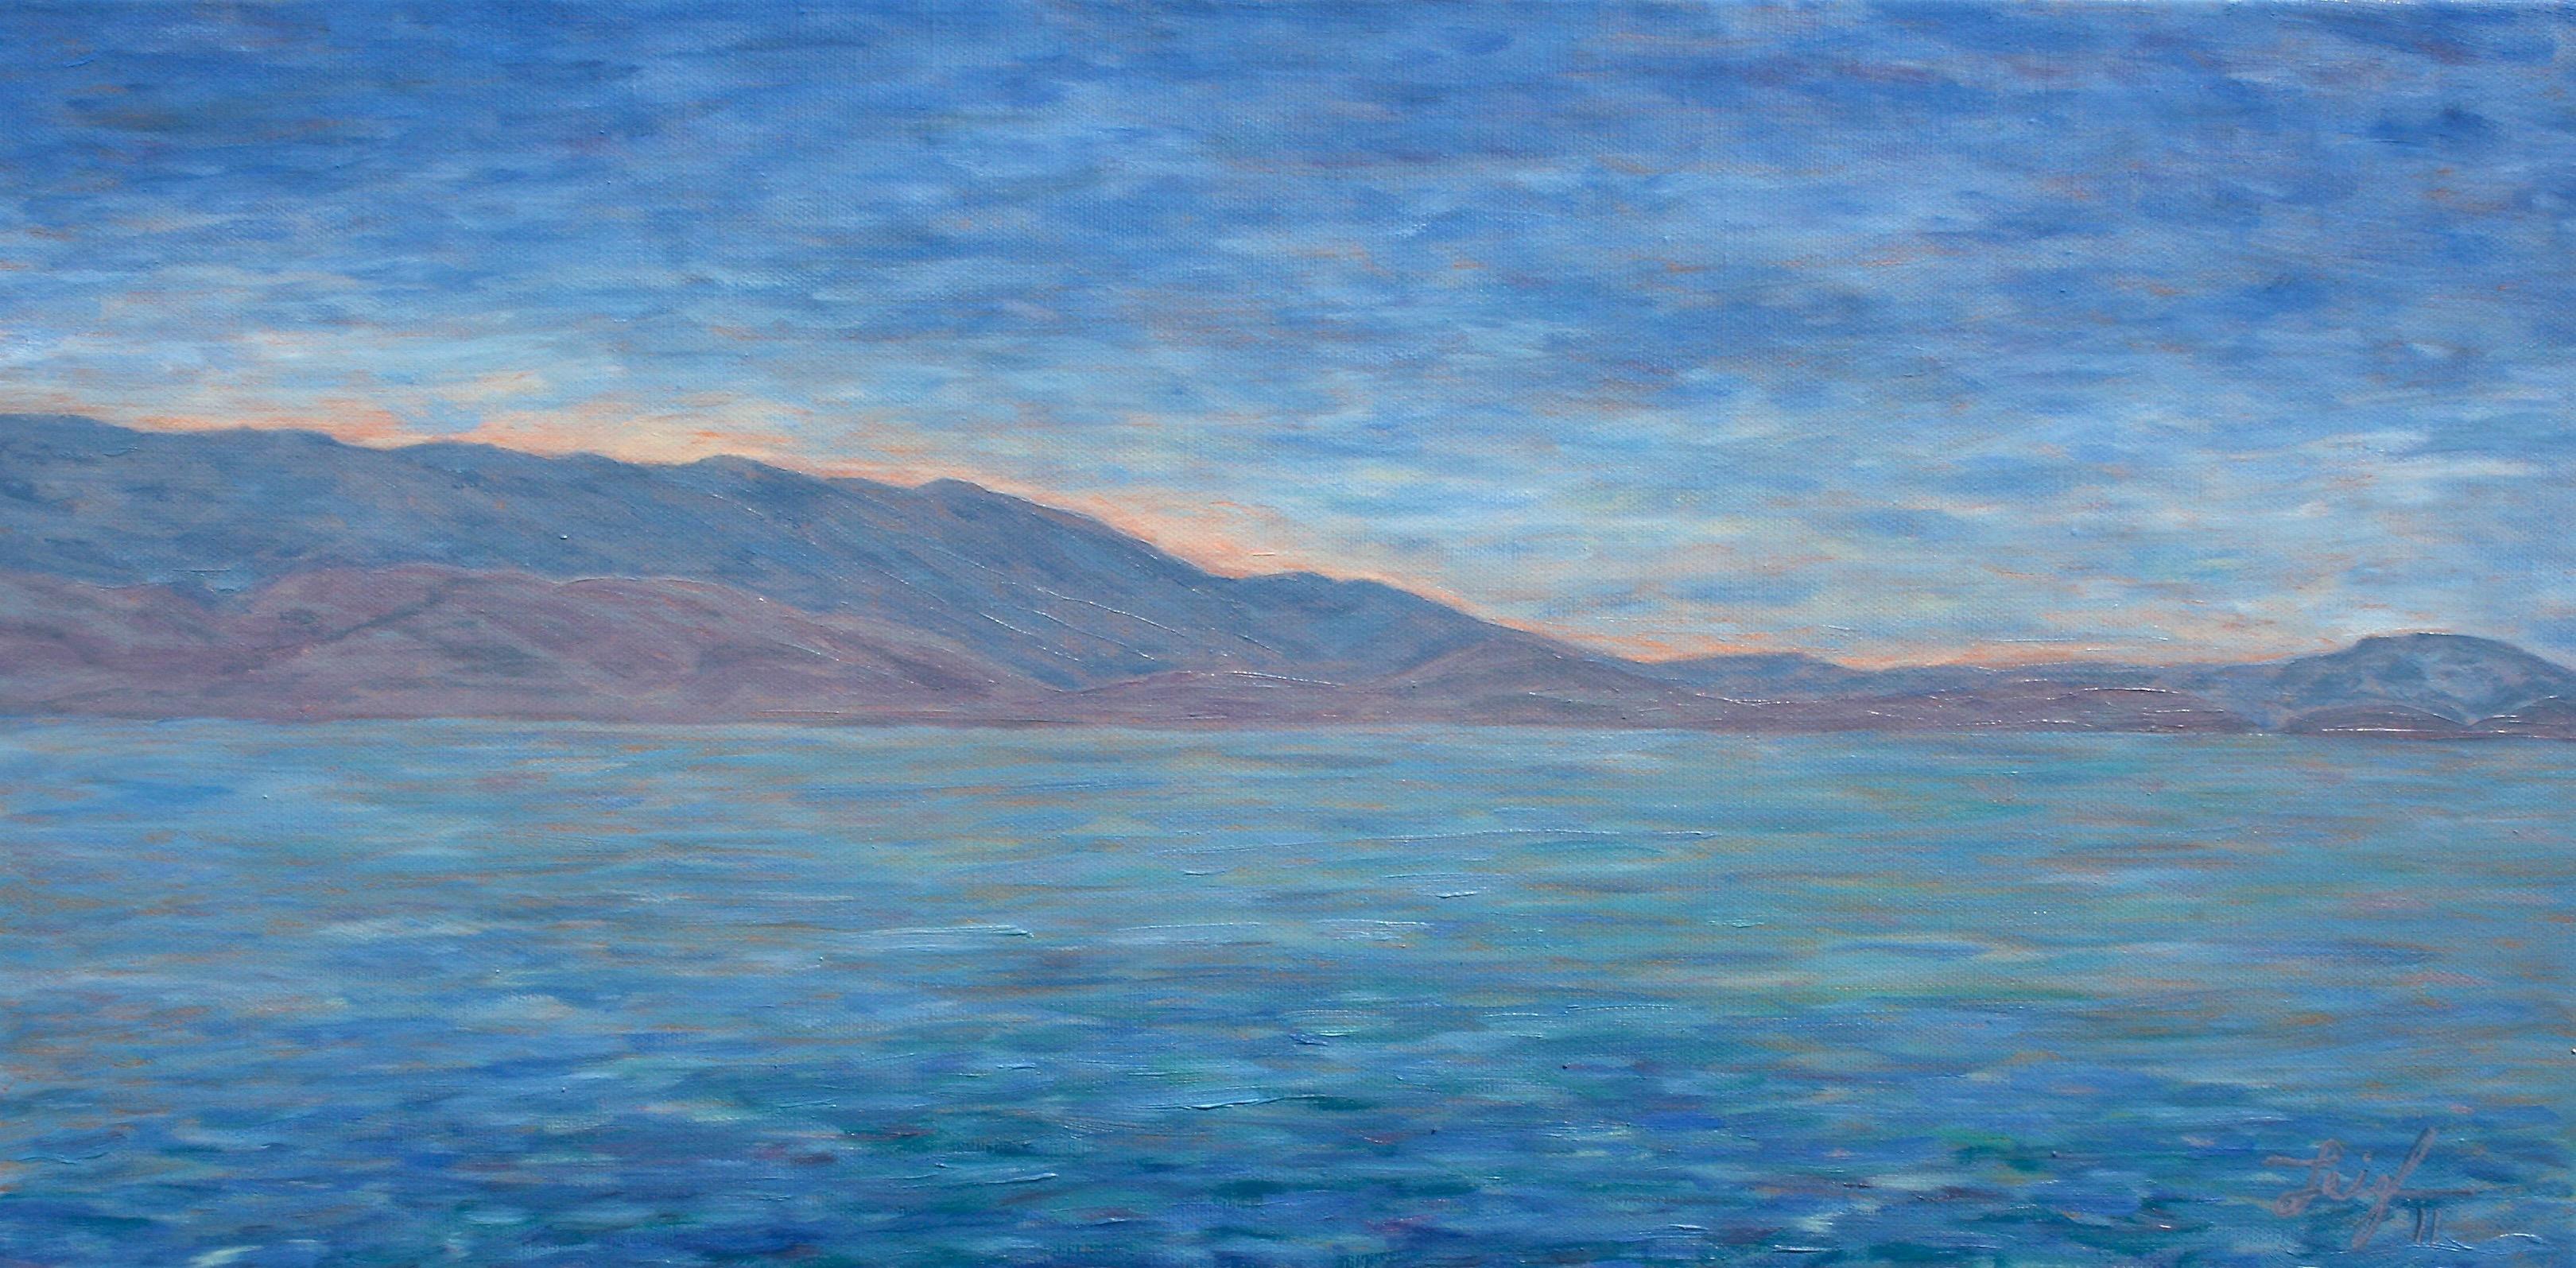 Flathead Calm  ~   Michelle Wolfson, Carlsbad, CA  2011  •  24 x 12